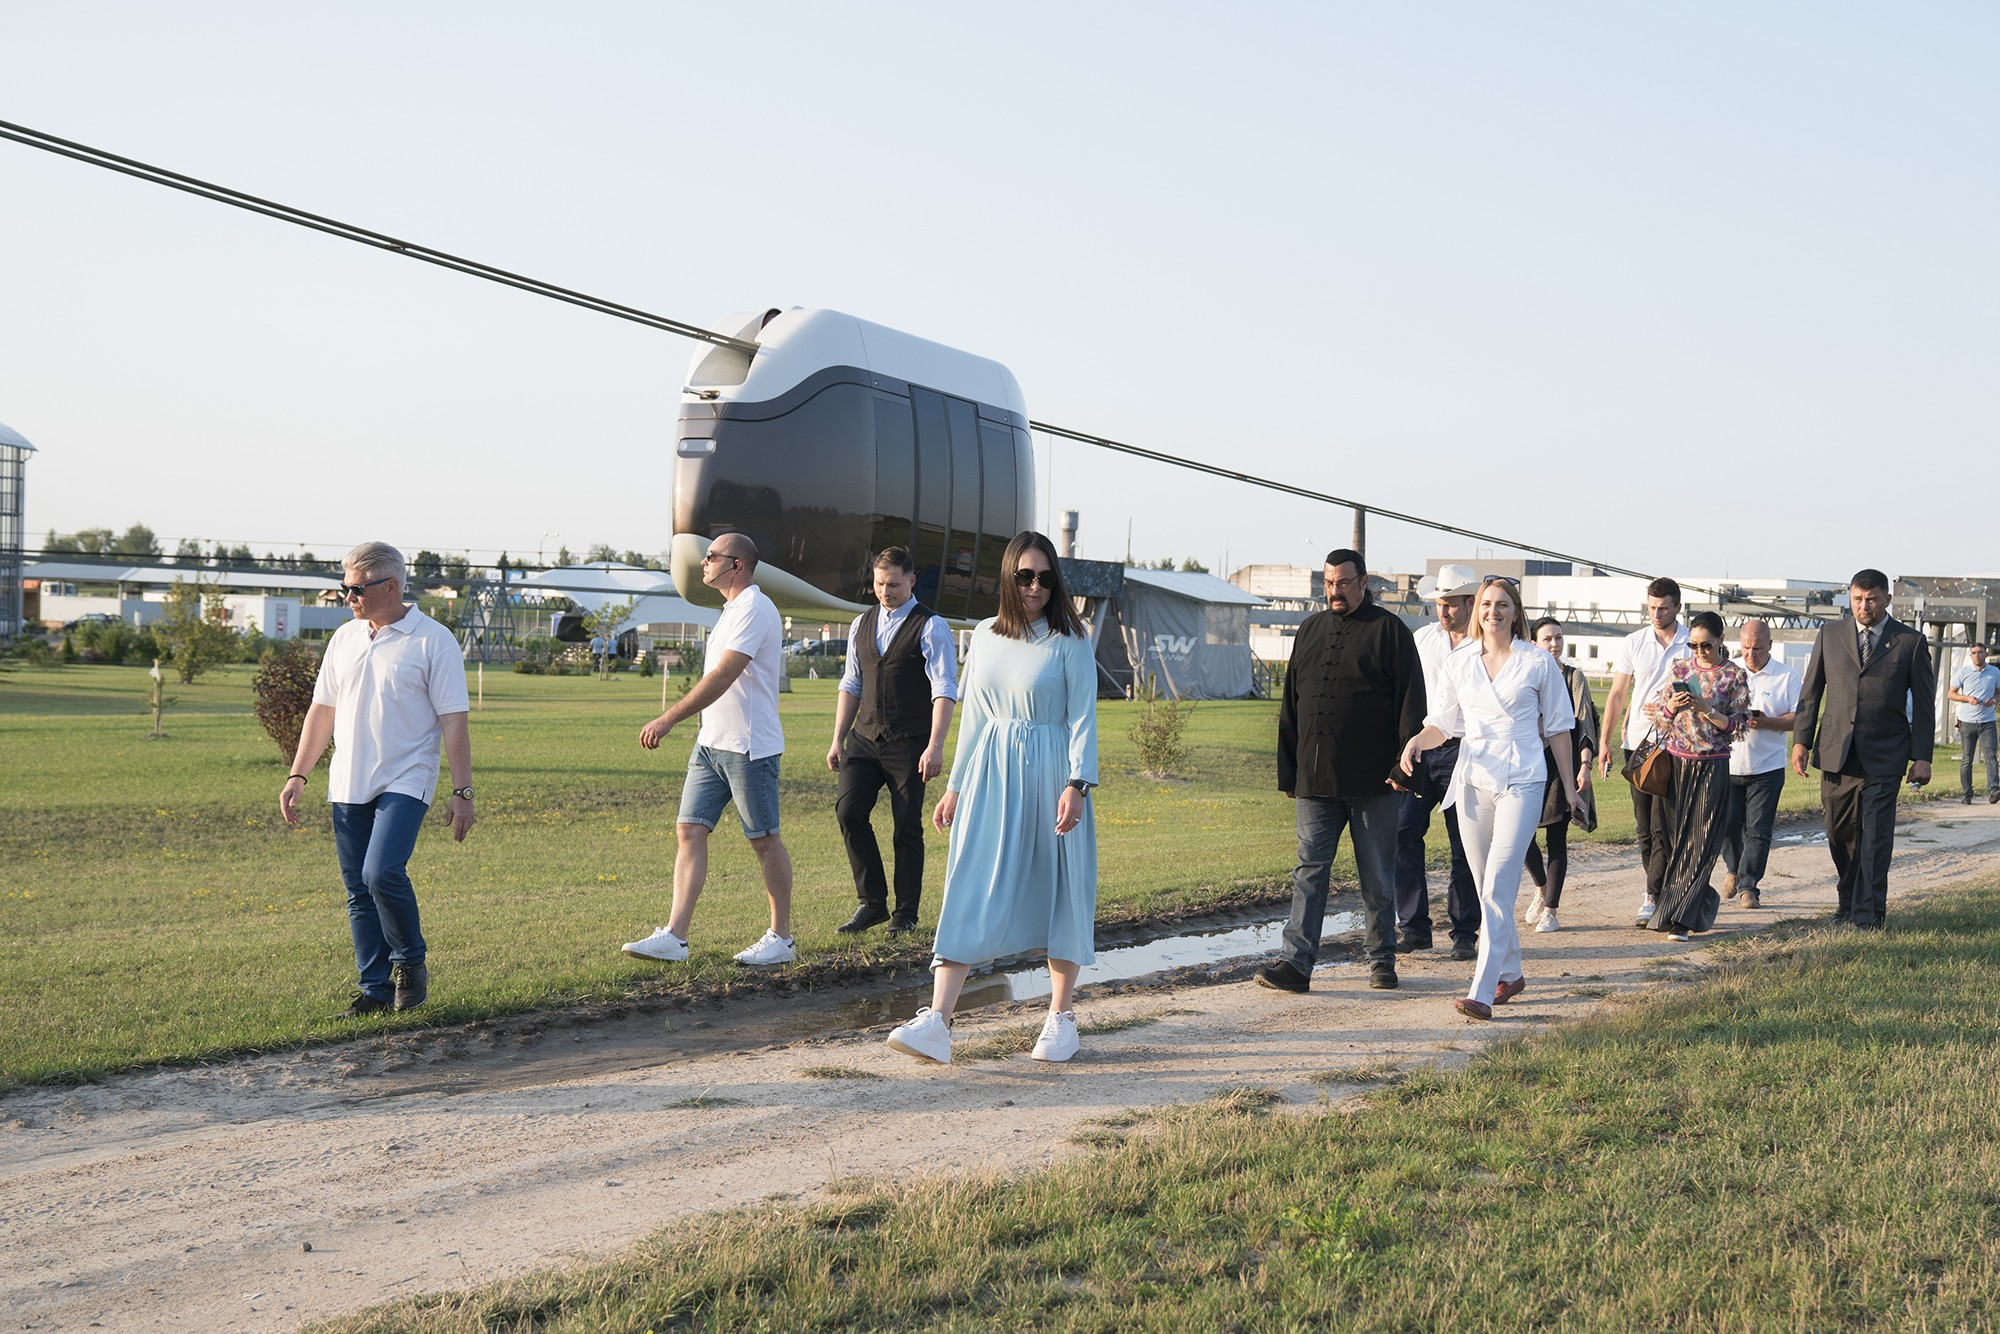 SkyWay, Sky Way, SkyWay in Belarus Yunitsky, string transport, EcoTechnoPark, Steven Seagal, visit